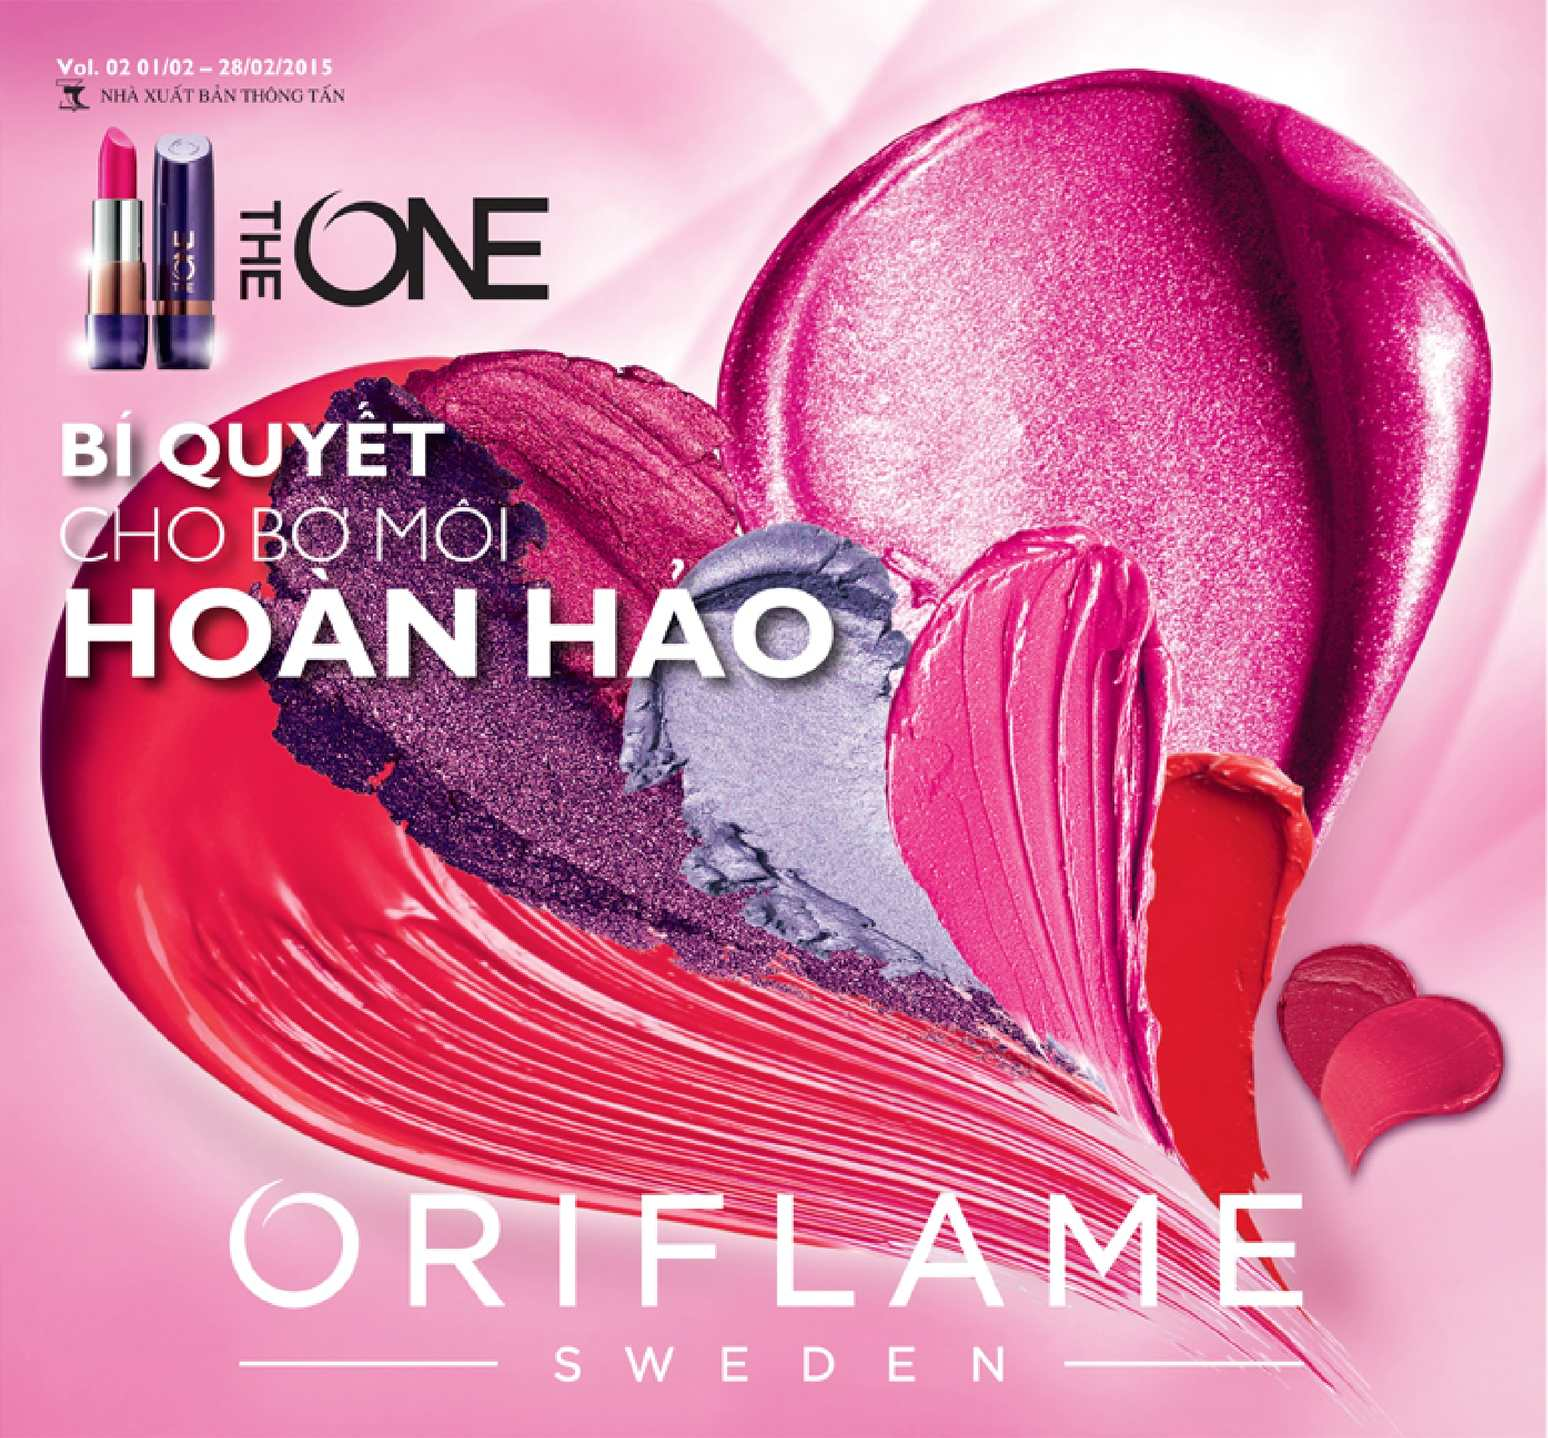 Catalogue My Pham Oriflame 2-2015